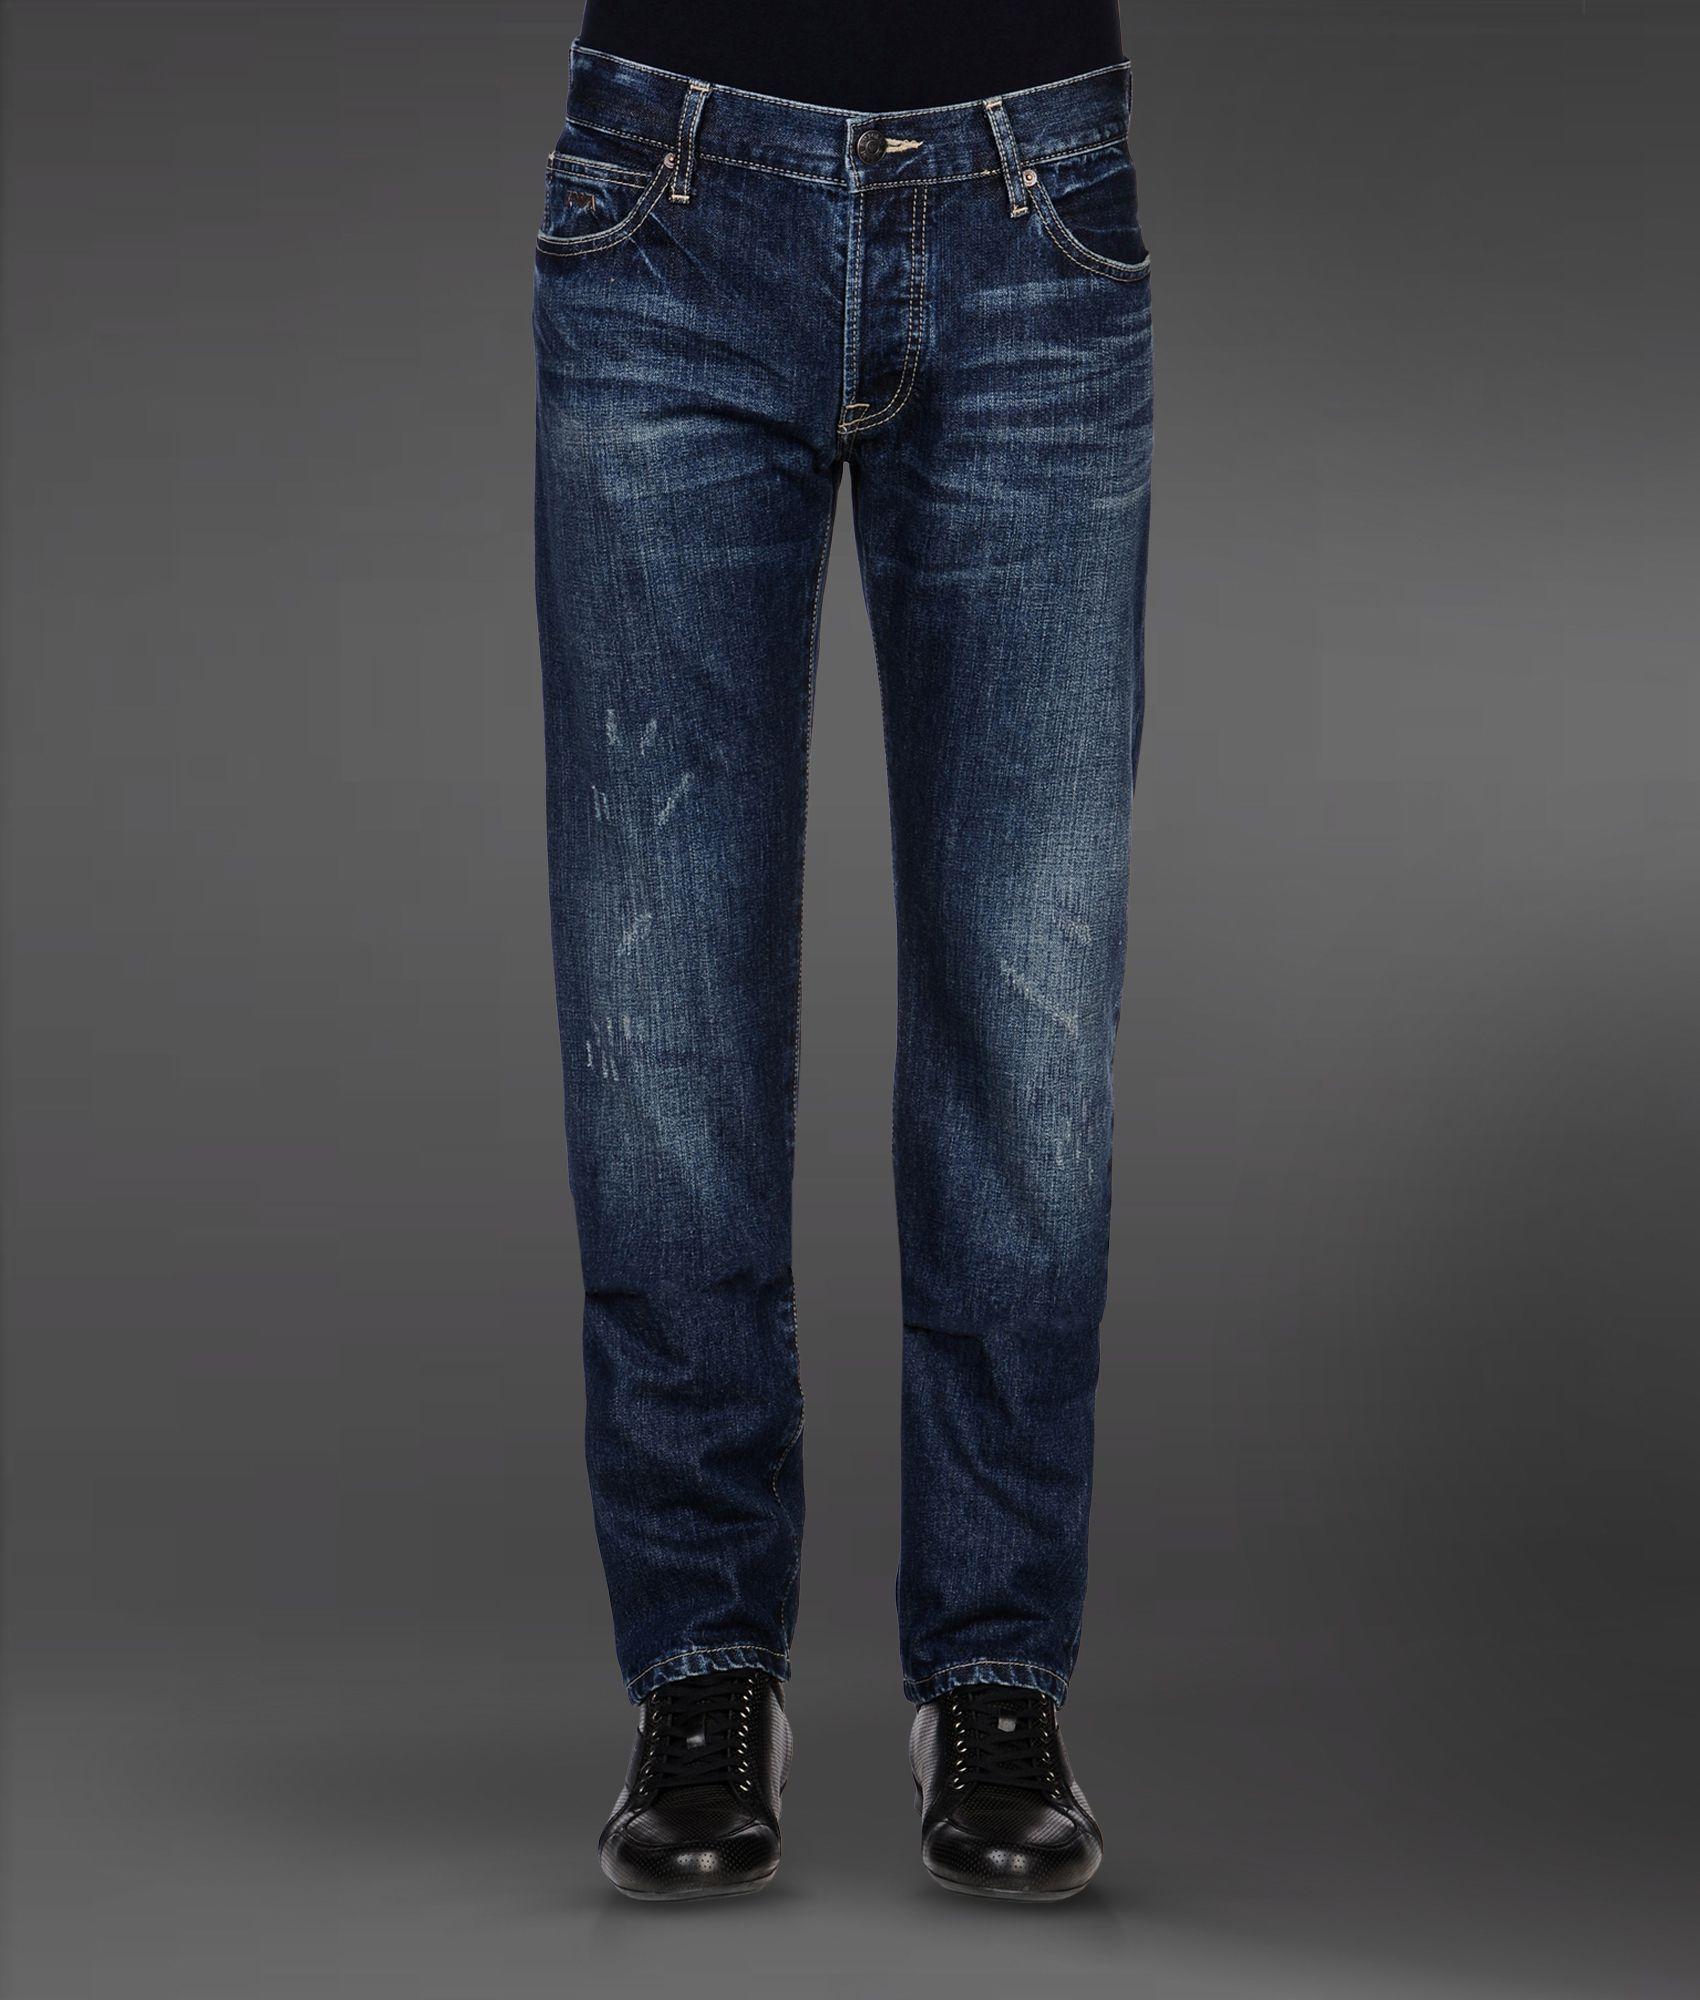 Lyst - Emporio armani Jeans in Blue for Men